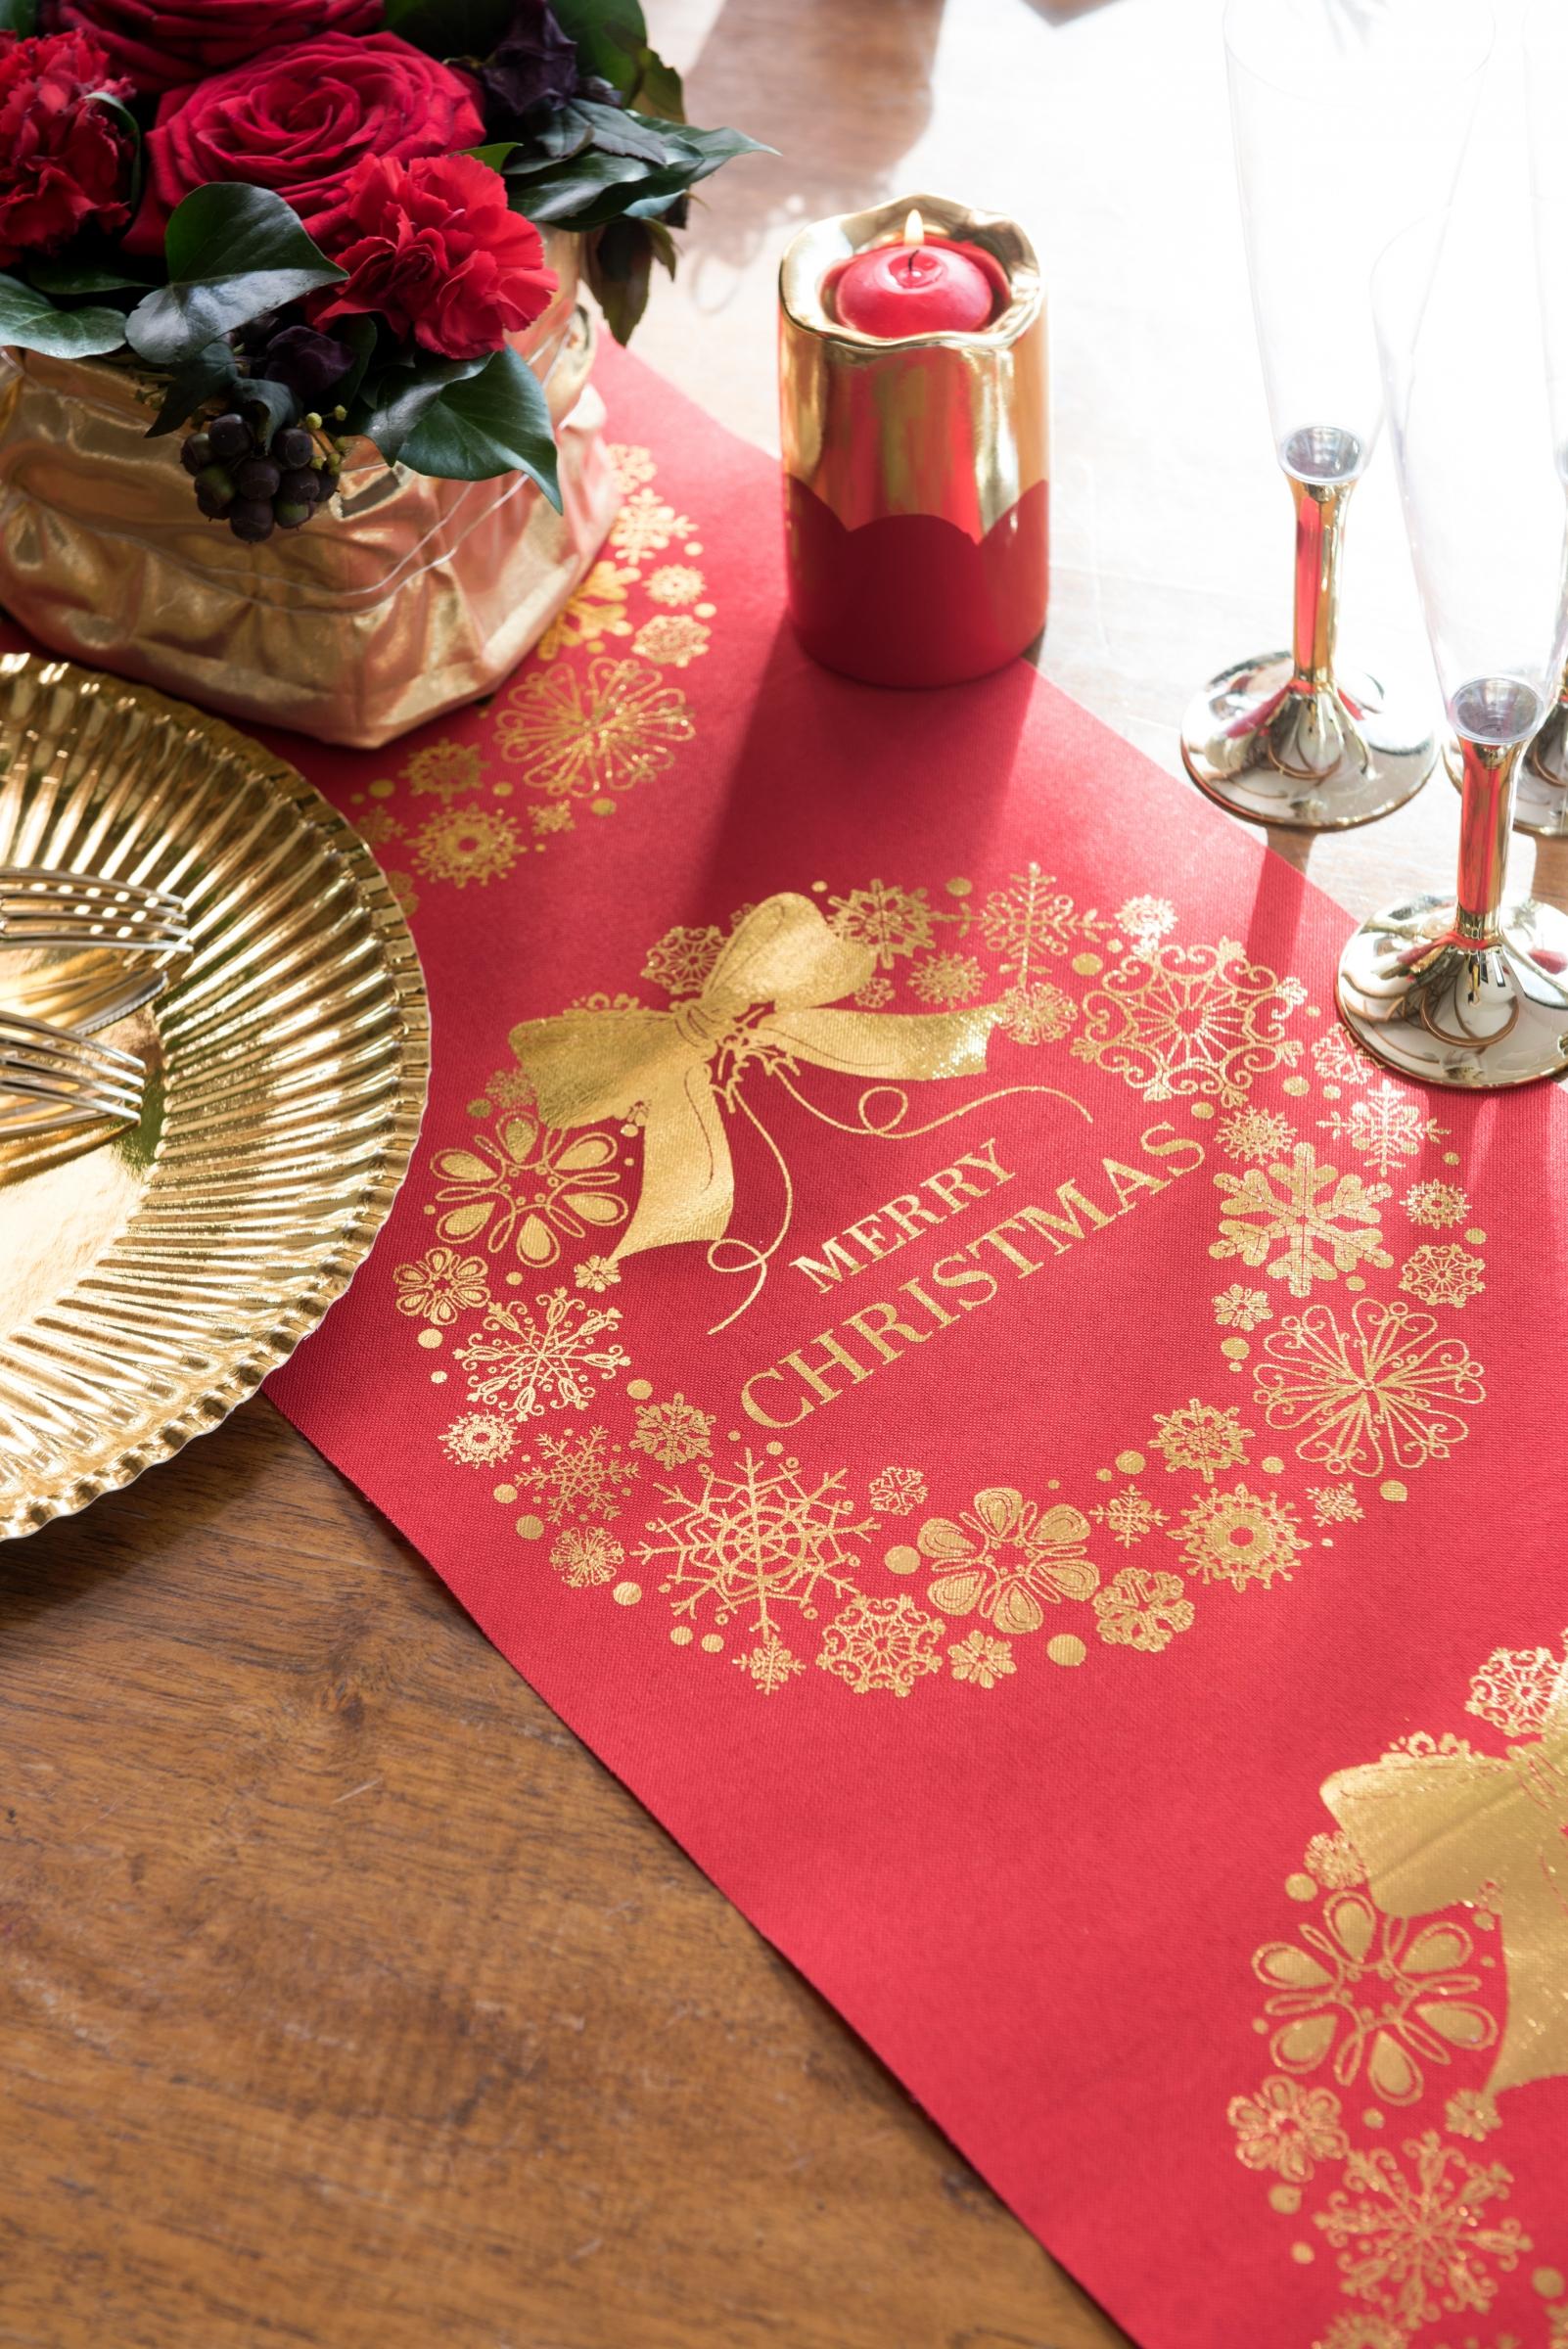 chemin de table merry christmas en tissu rouge et dor 3 m. Black Bedroom Furniture Sets. Home Design Ideas